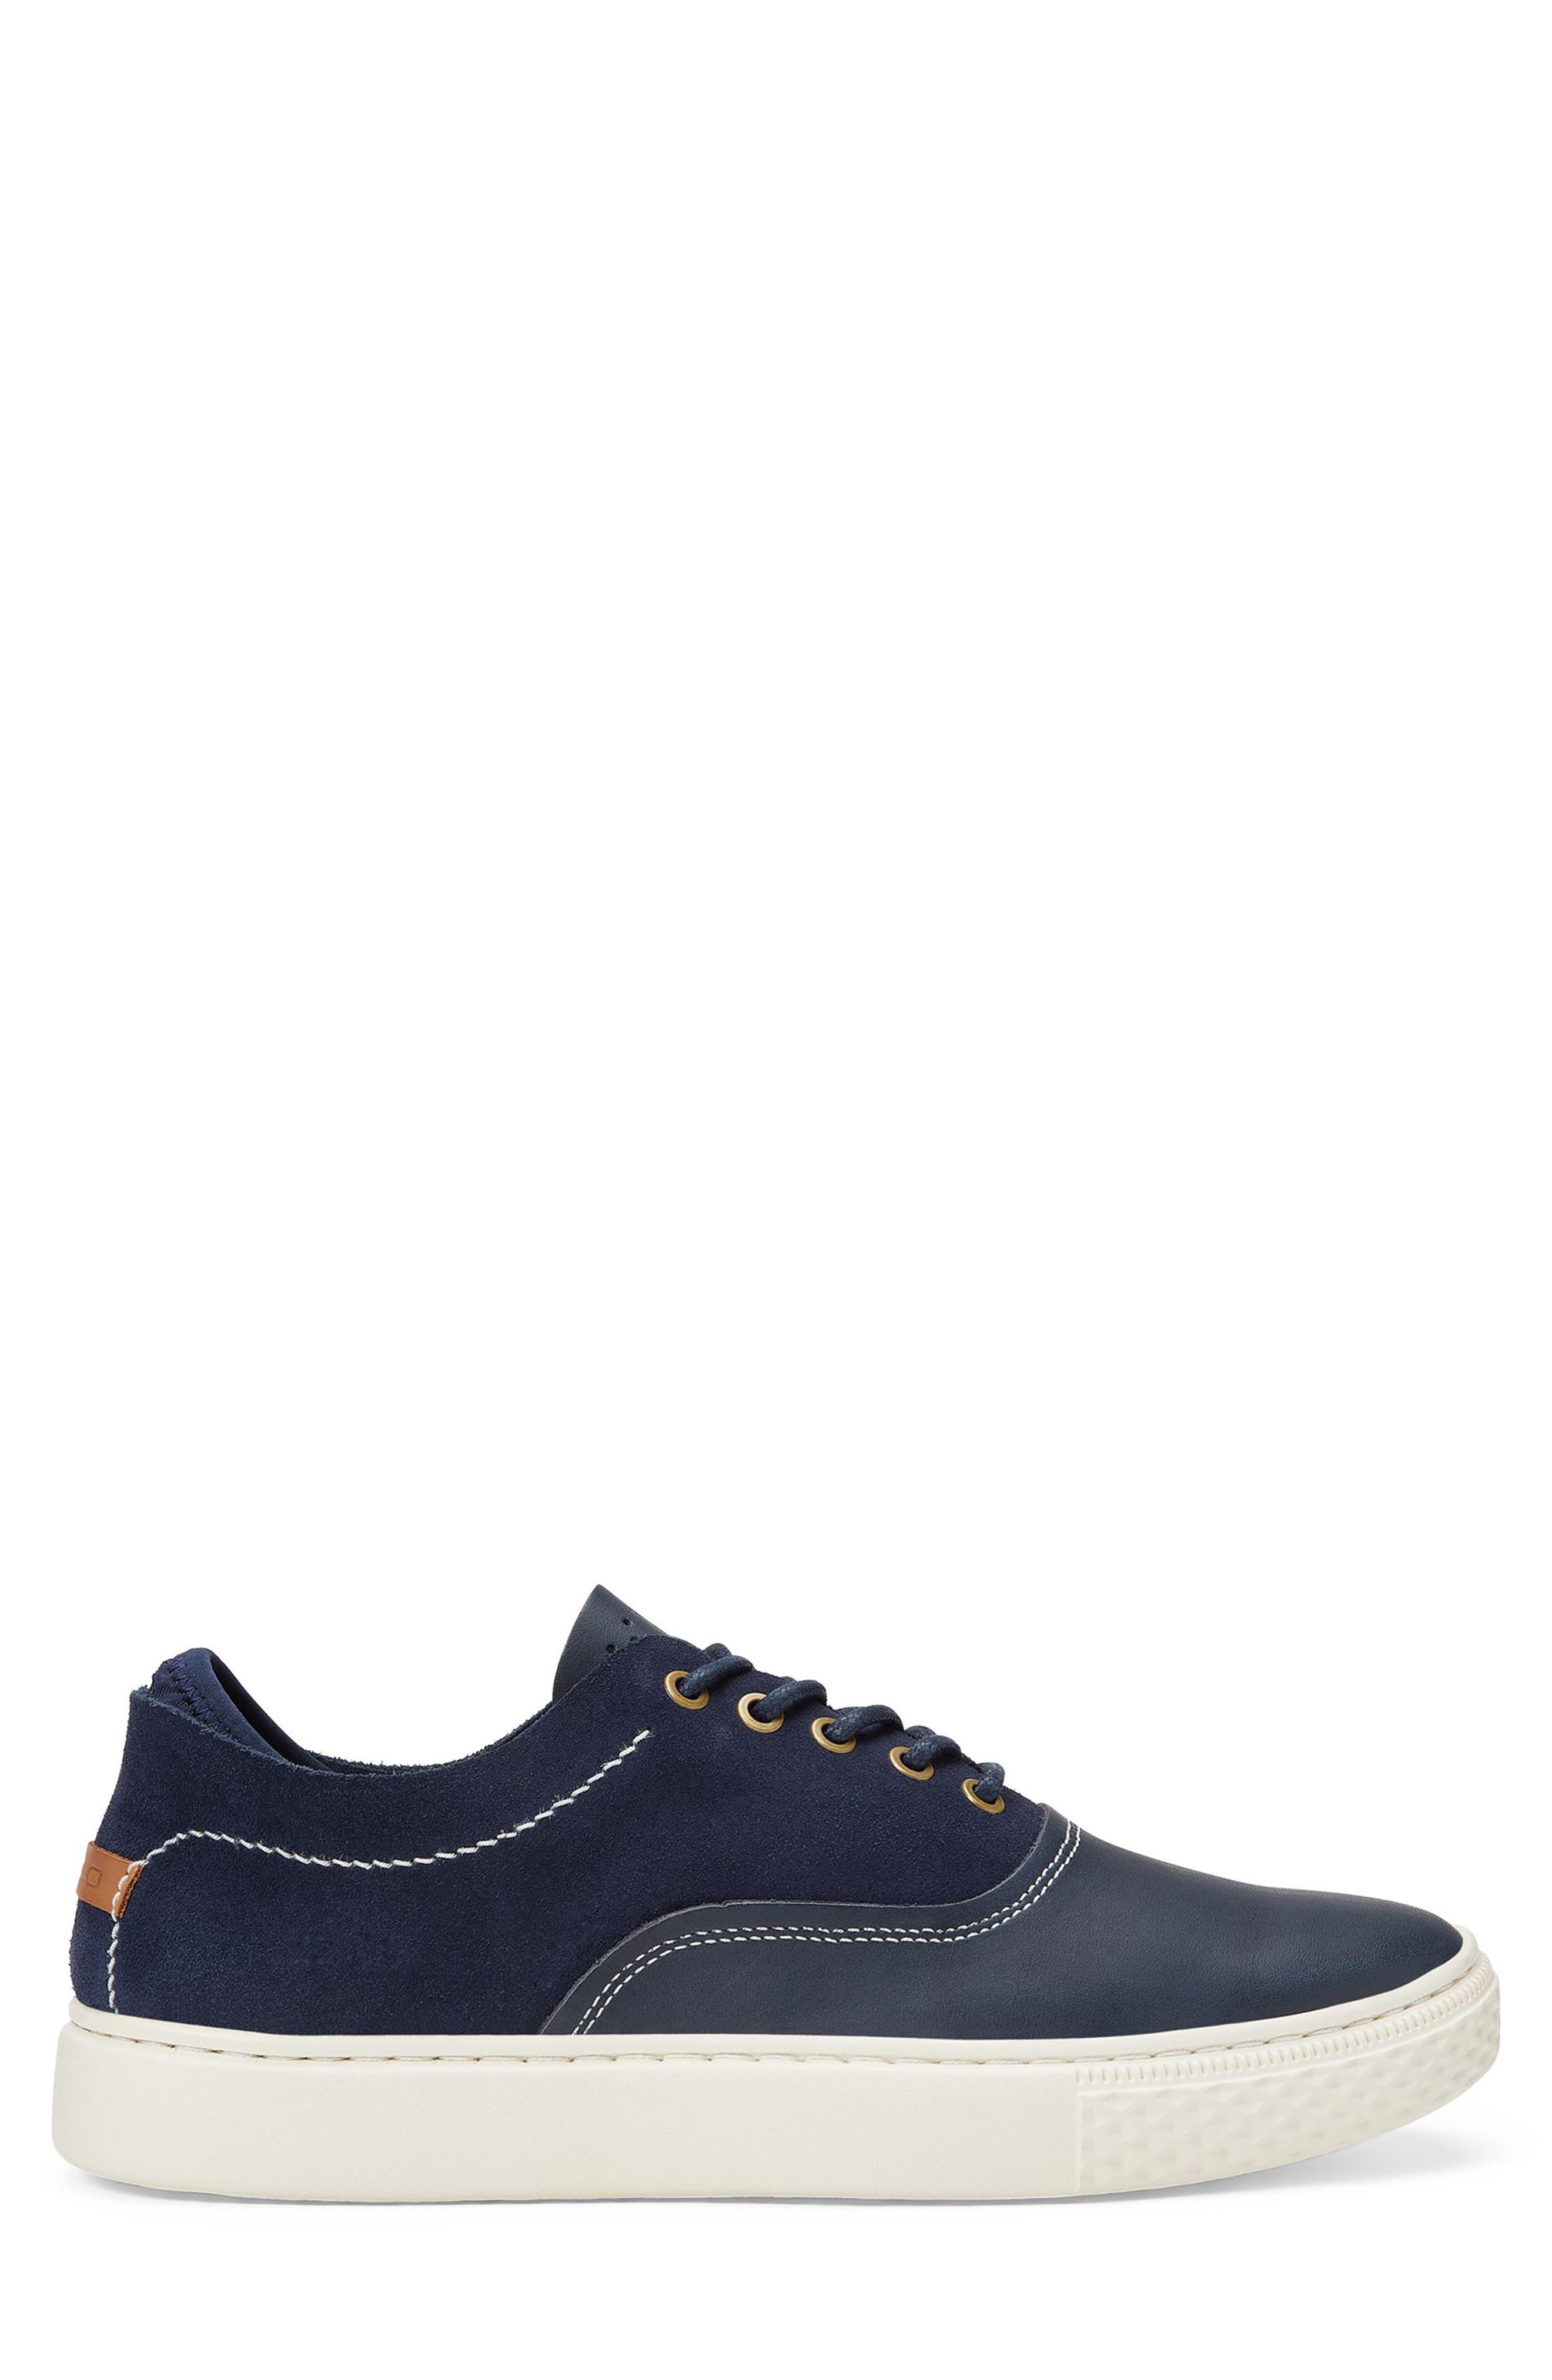 POLO RALPH LAUREN, Thorton 100 Sneaker, Alternate thumbnail 3, color, 410